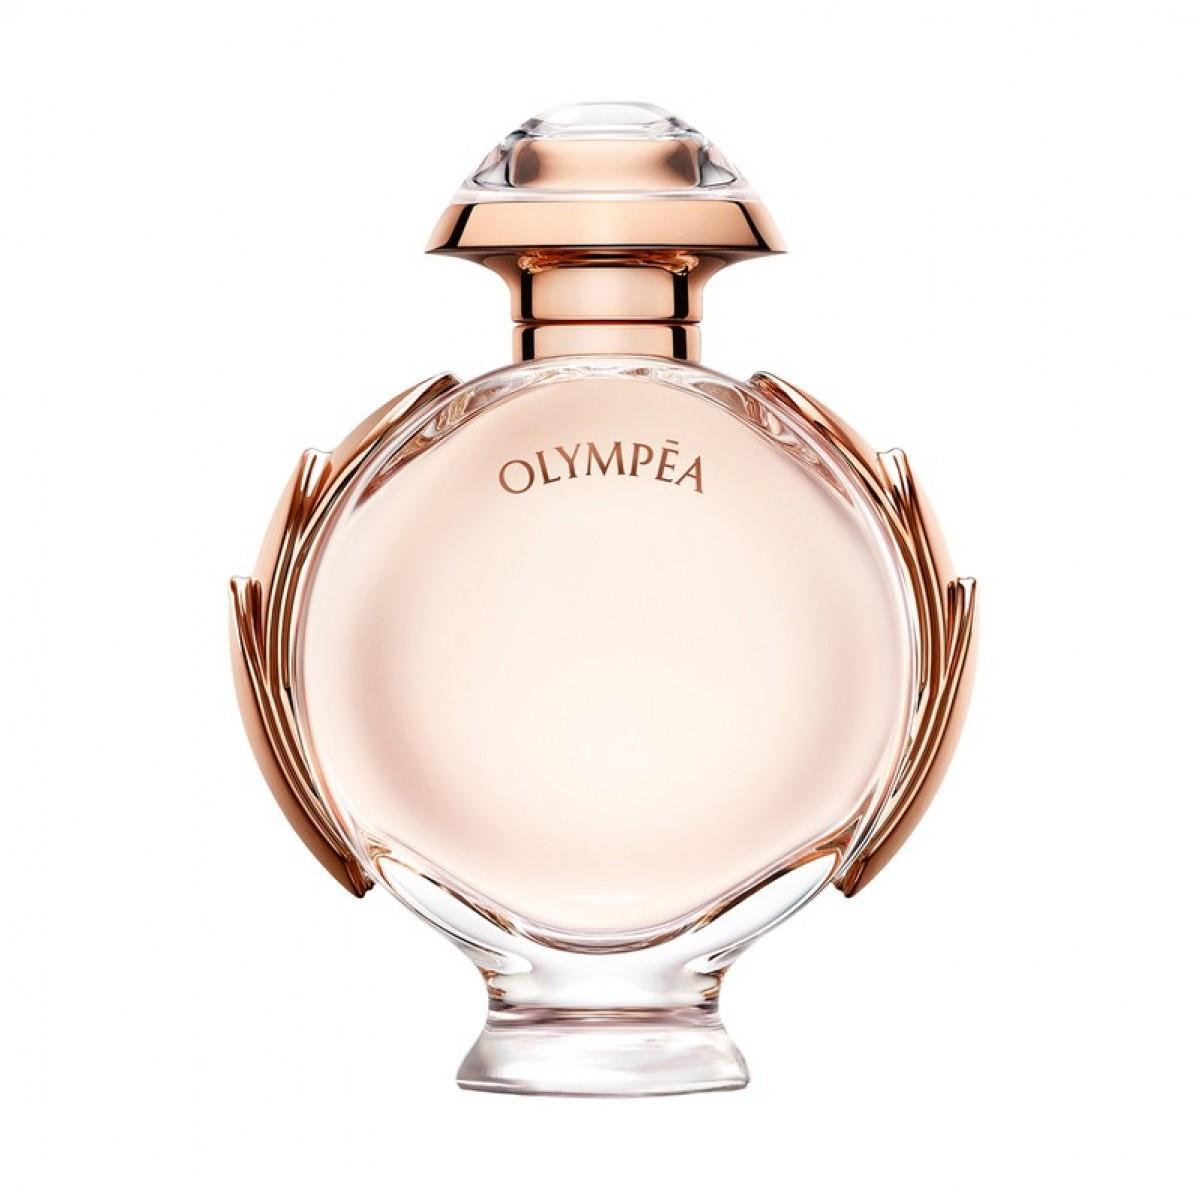 Olympea Eau de Parfum